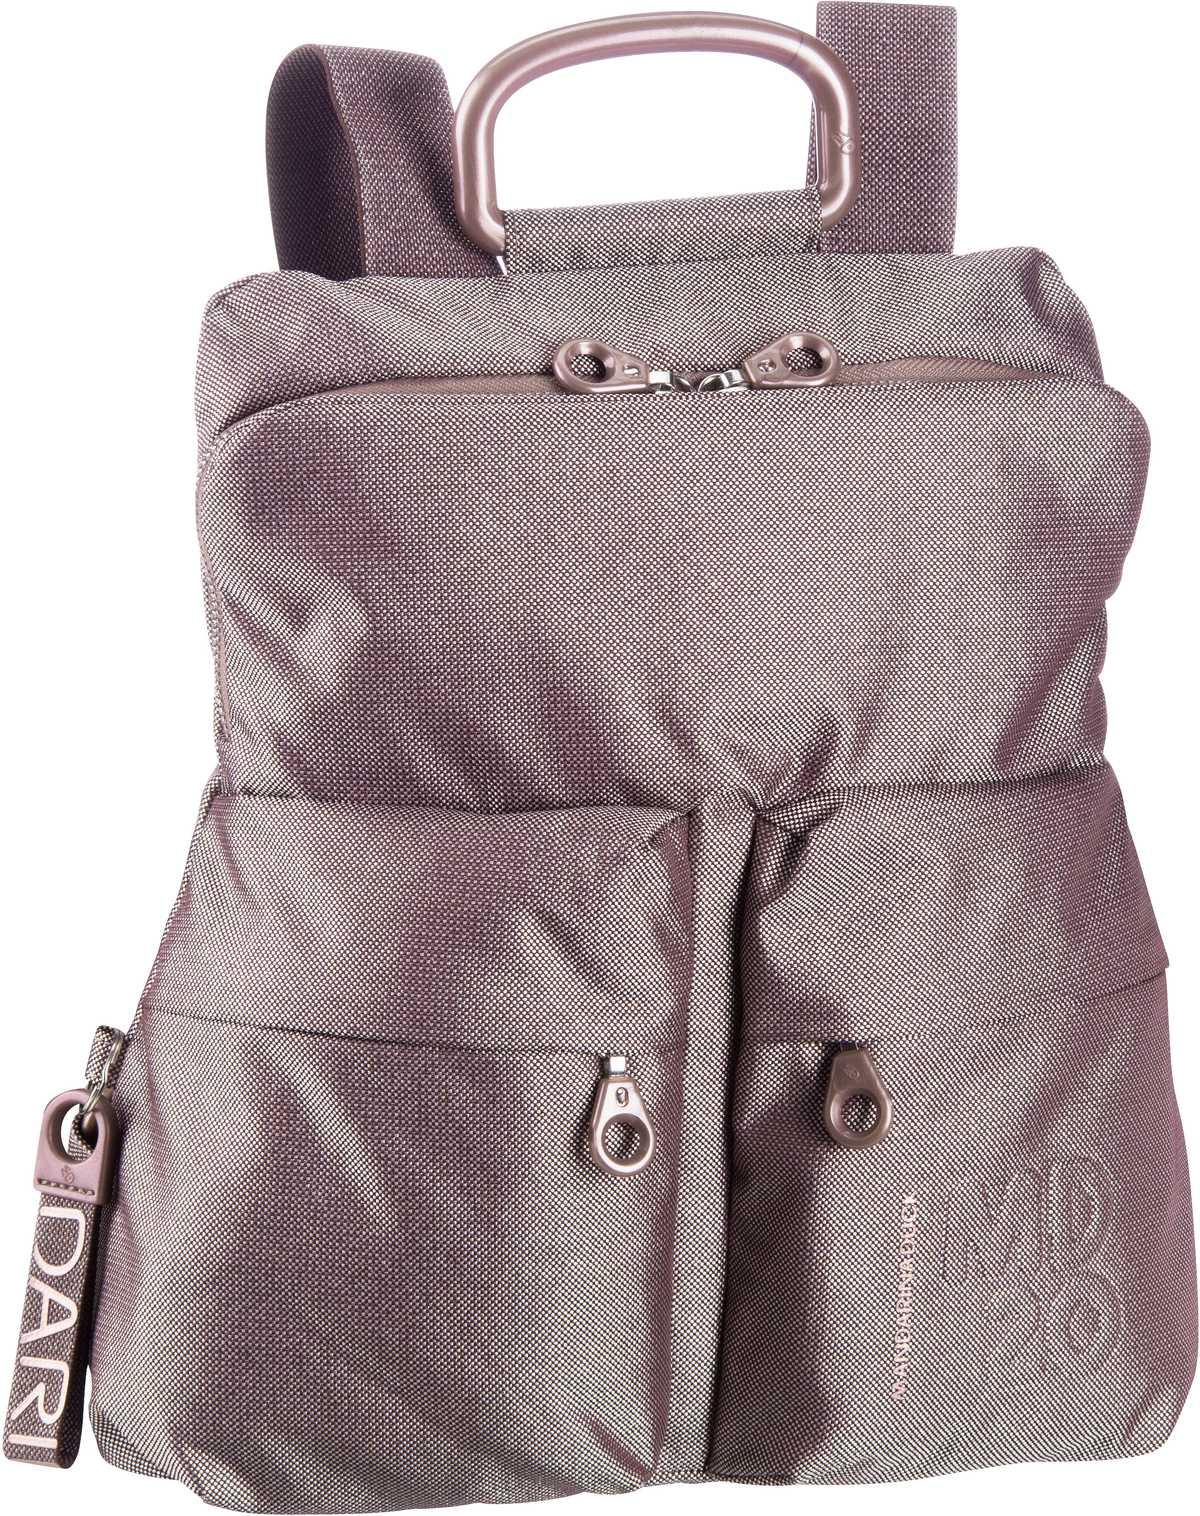 Rucksack / Daypack MD20 Lux Backpack QNTZ4 Smog